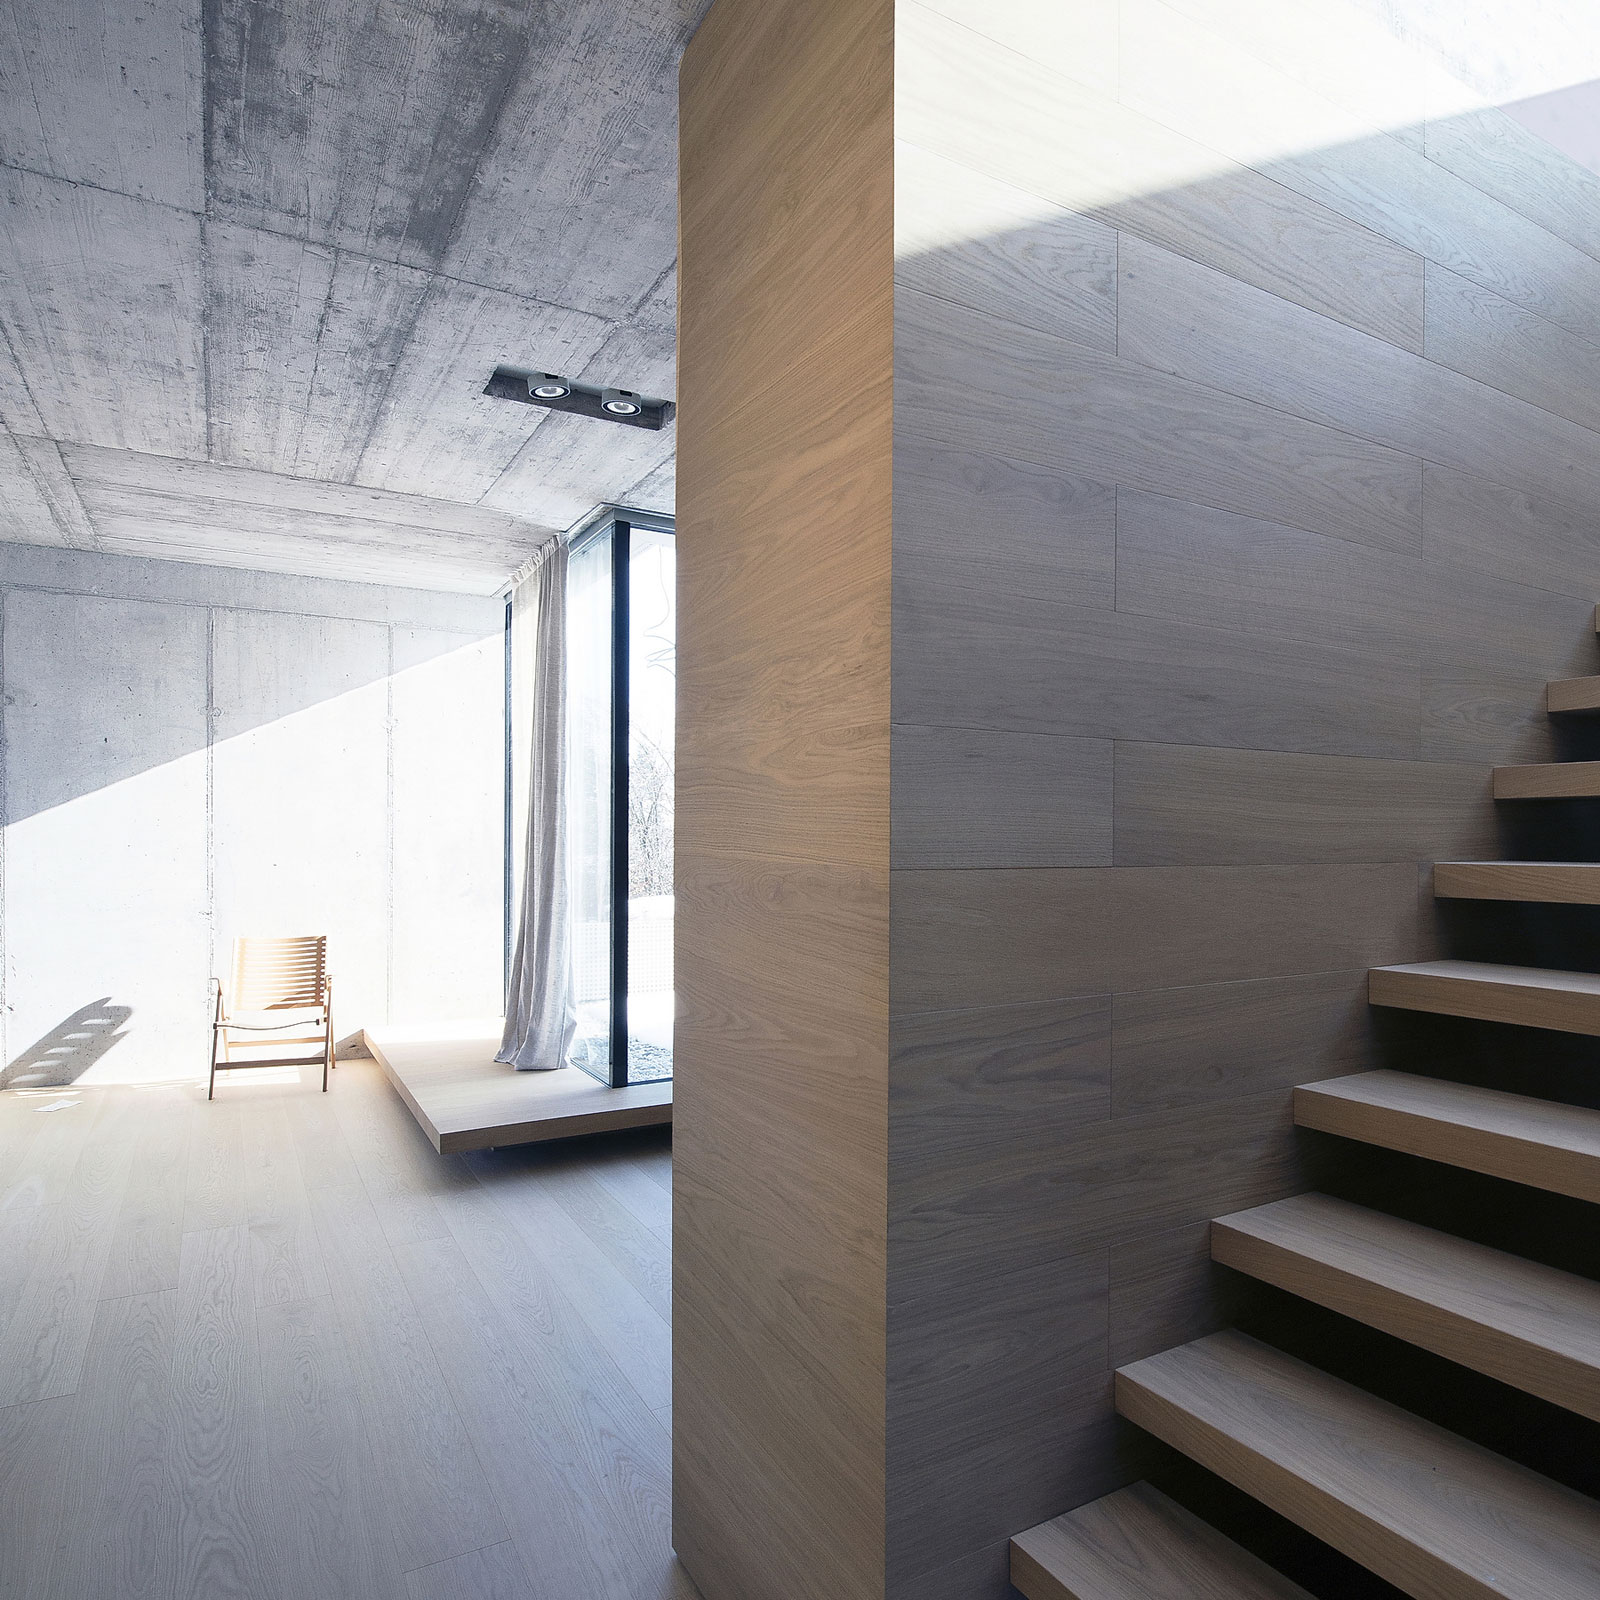 Villa Criss-Cross Envelope Located in Ljubljana by OFIS Architects-15